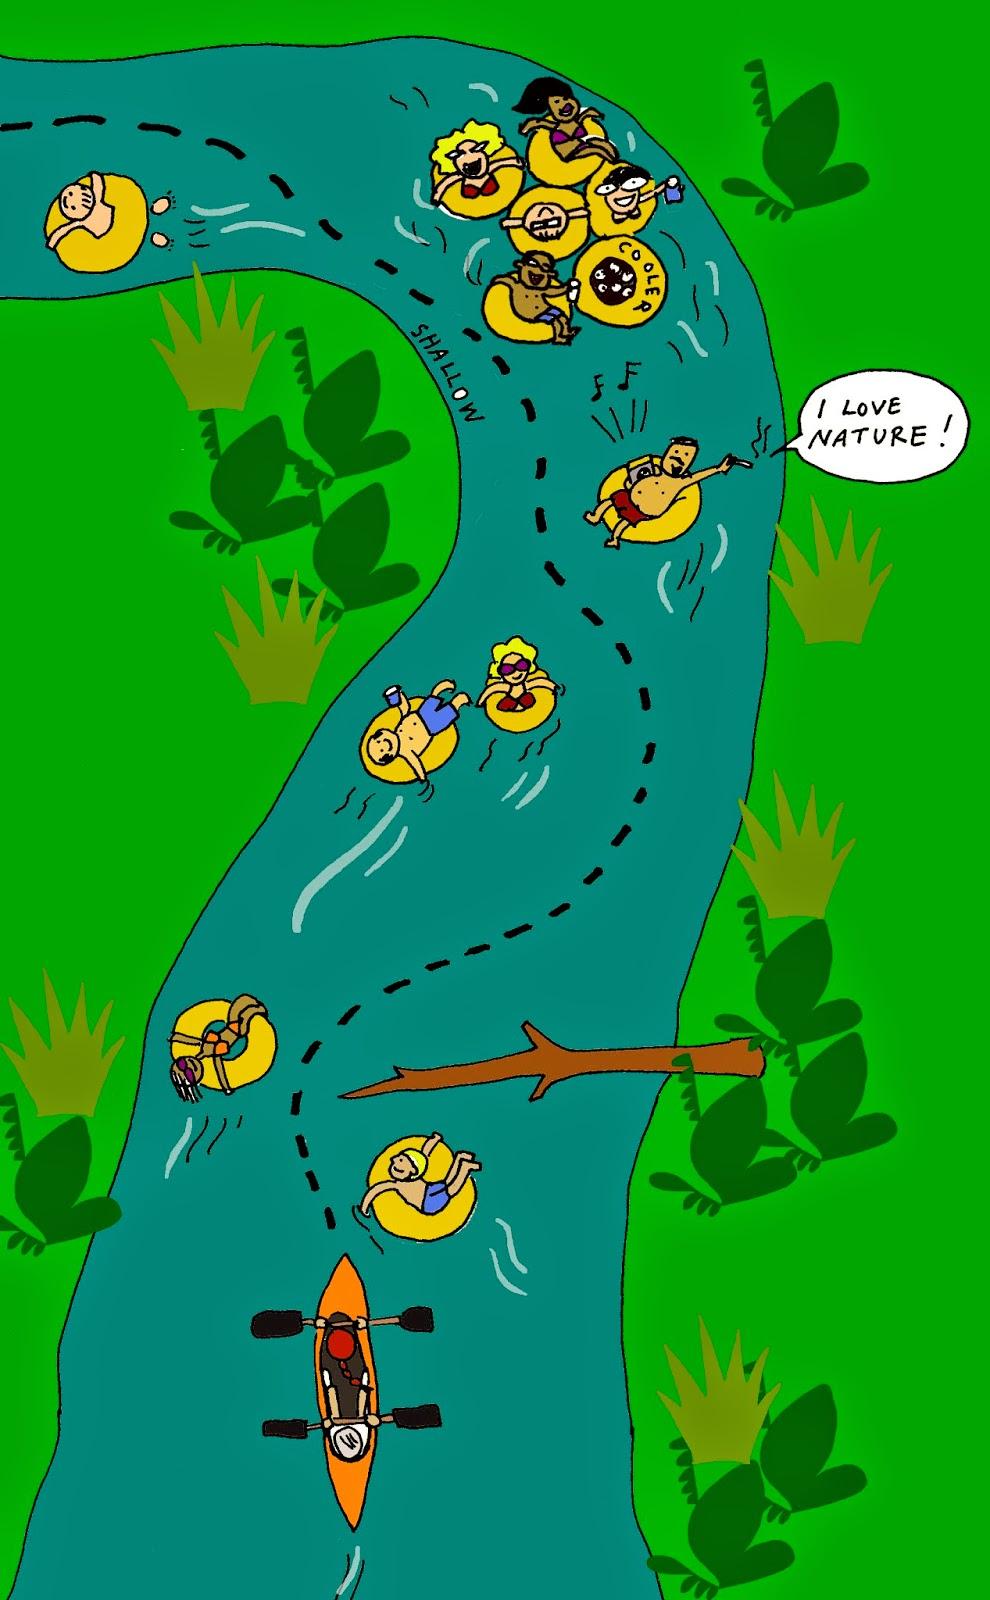 Free Tubing Cliparts, Download Free Clip Art, Free Clip Art.